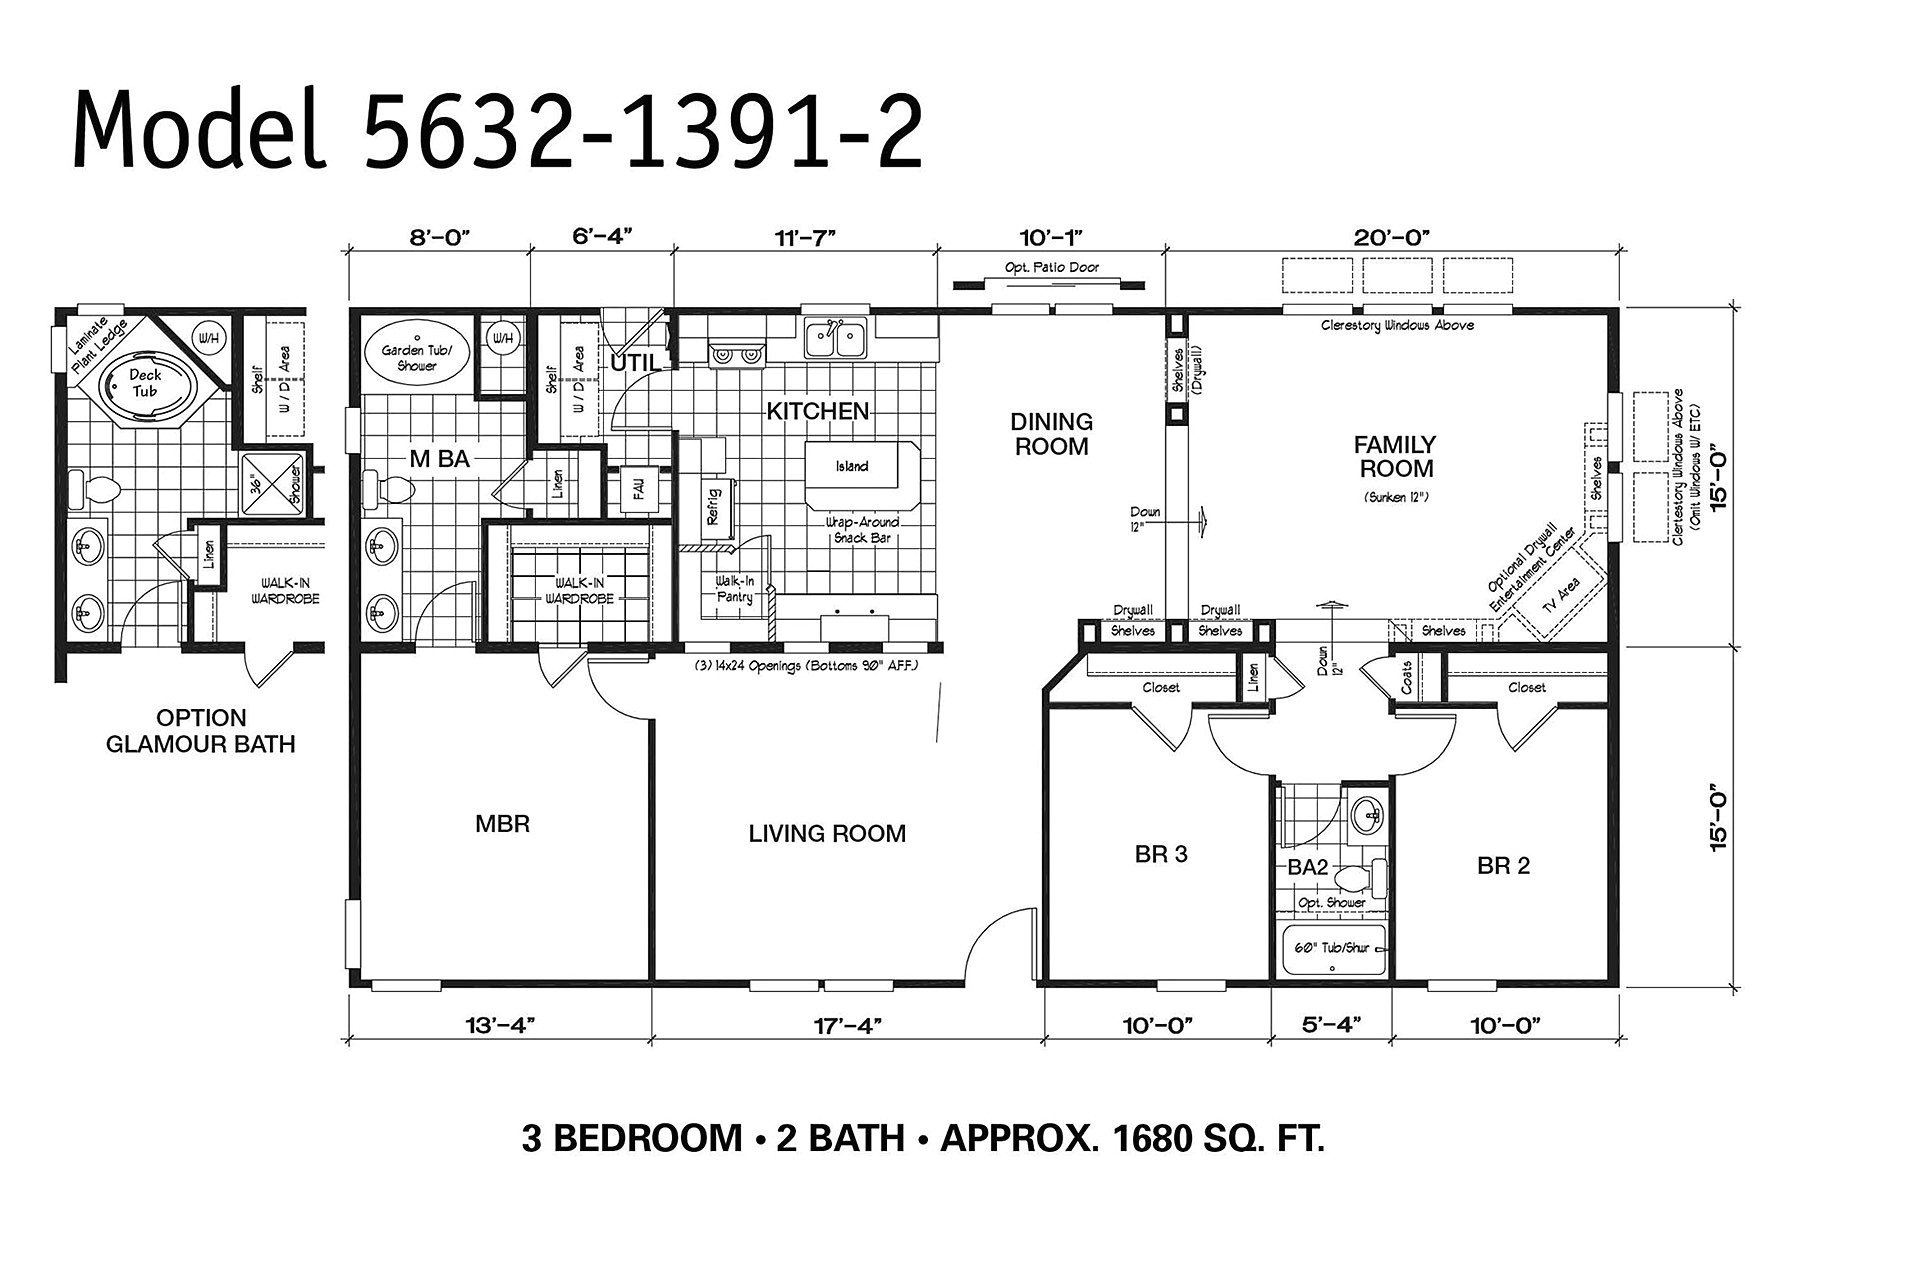 1997 oakwood mobile home floor plan